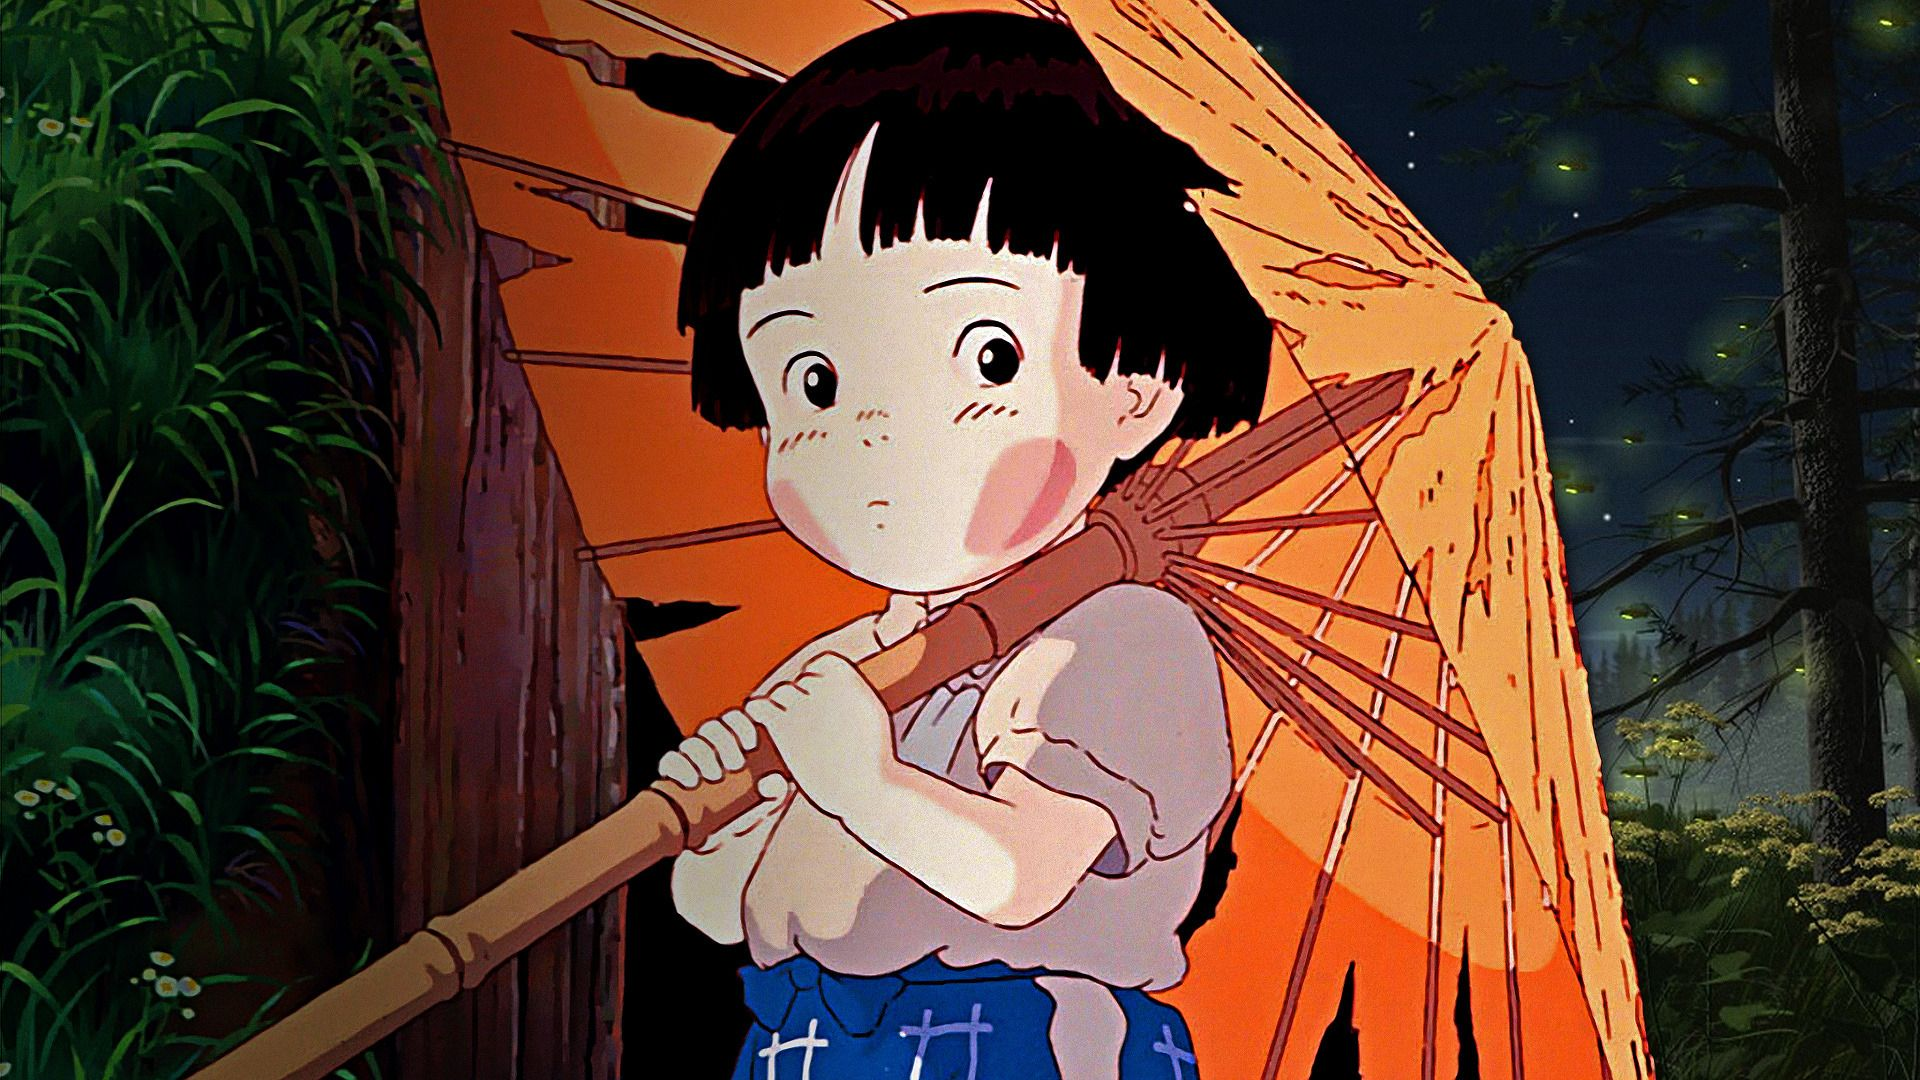 Pin by Norazna Abdul Razak on Desktop wallpapers Anime